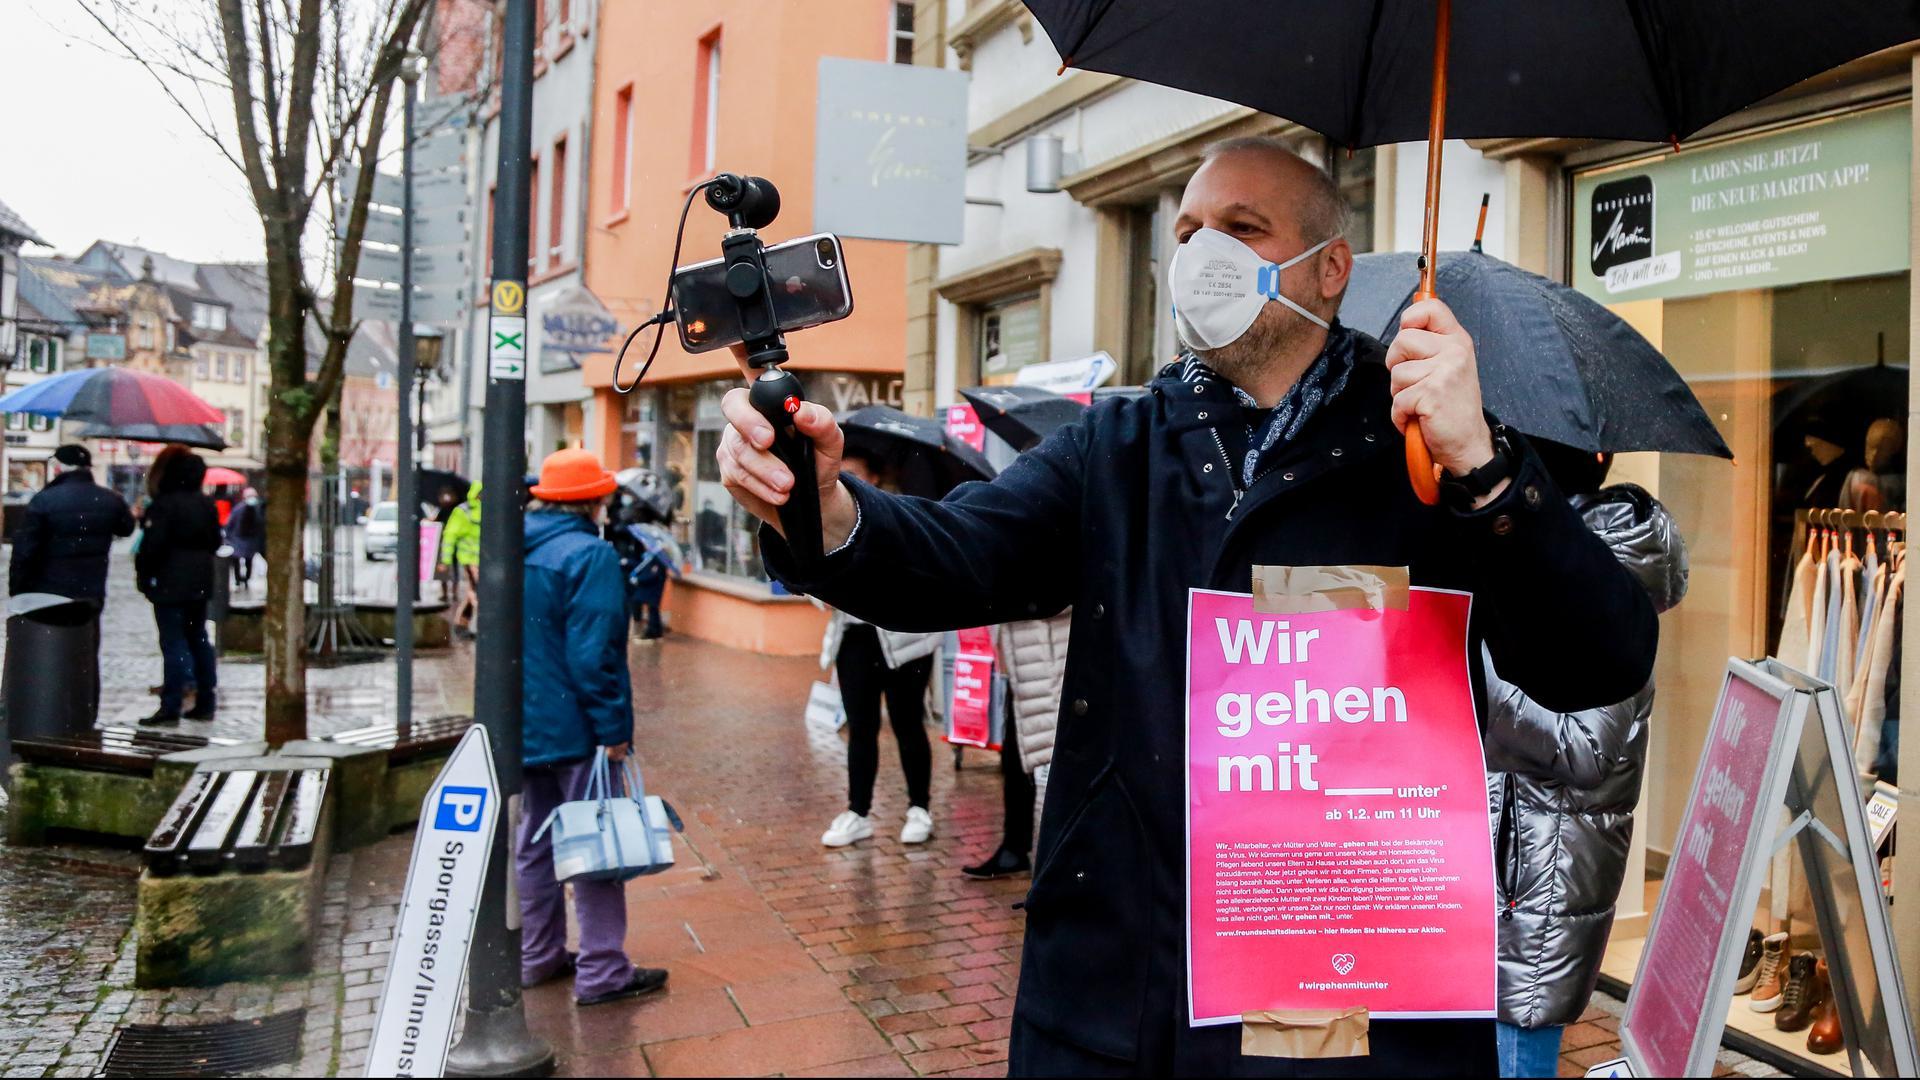 Mann filmt Protest